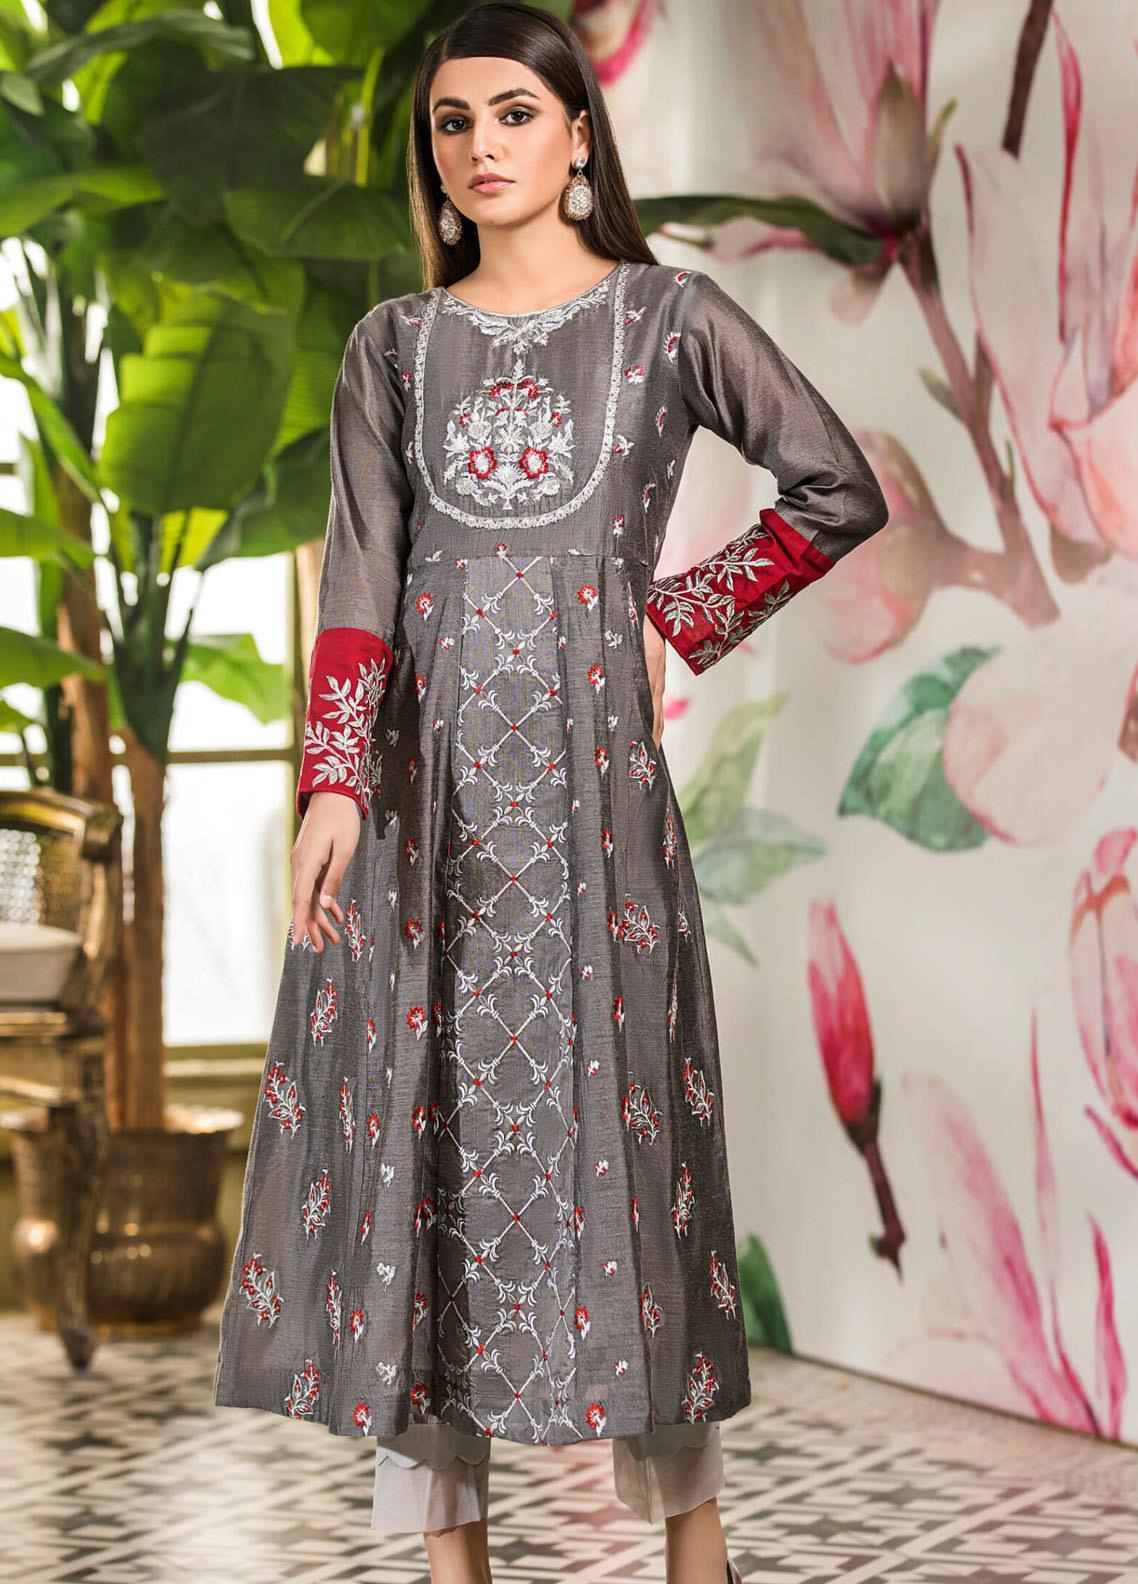 Kross Kulture Embroidered Cotton Net Stitched Kurtis KK21C KX-20698 Grey